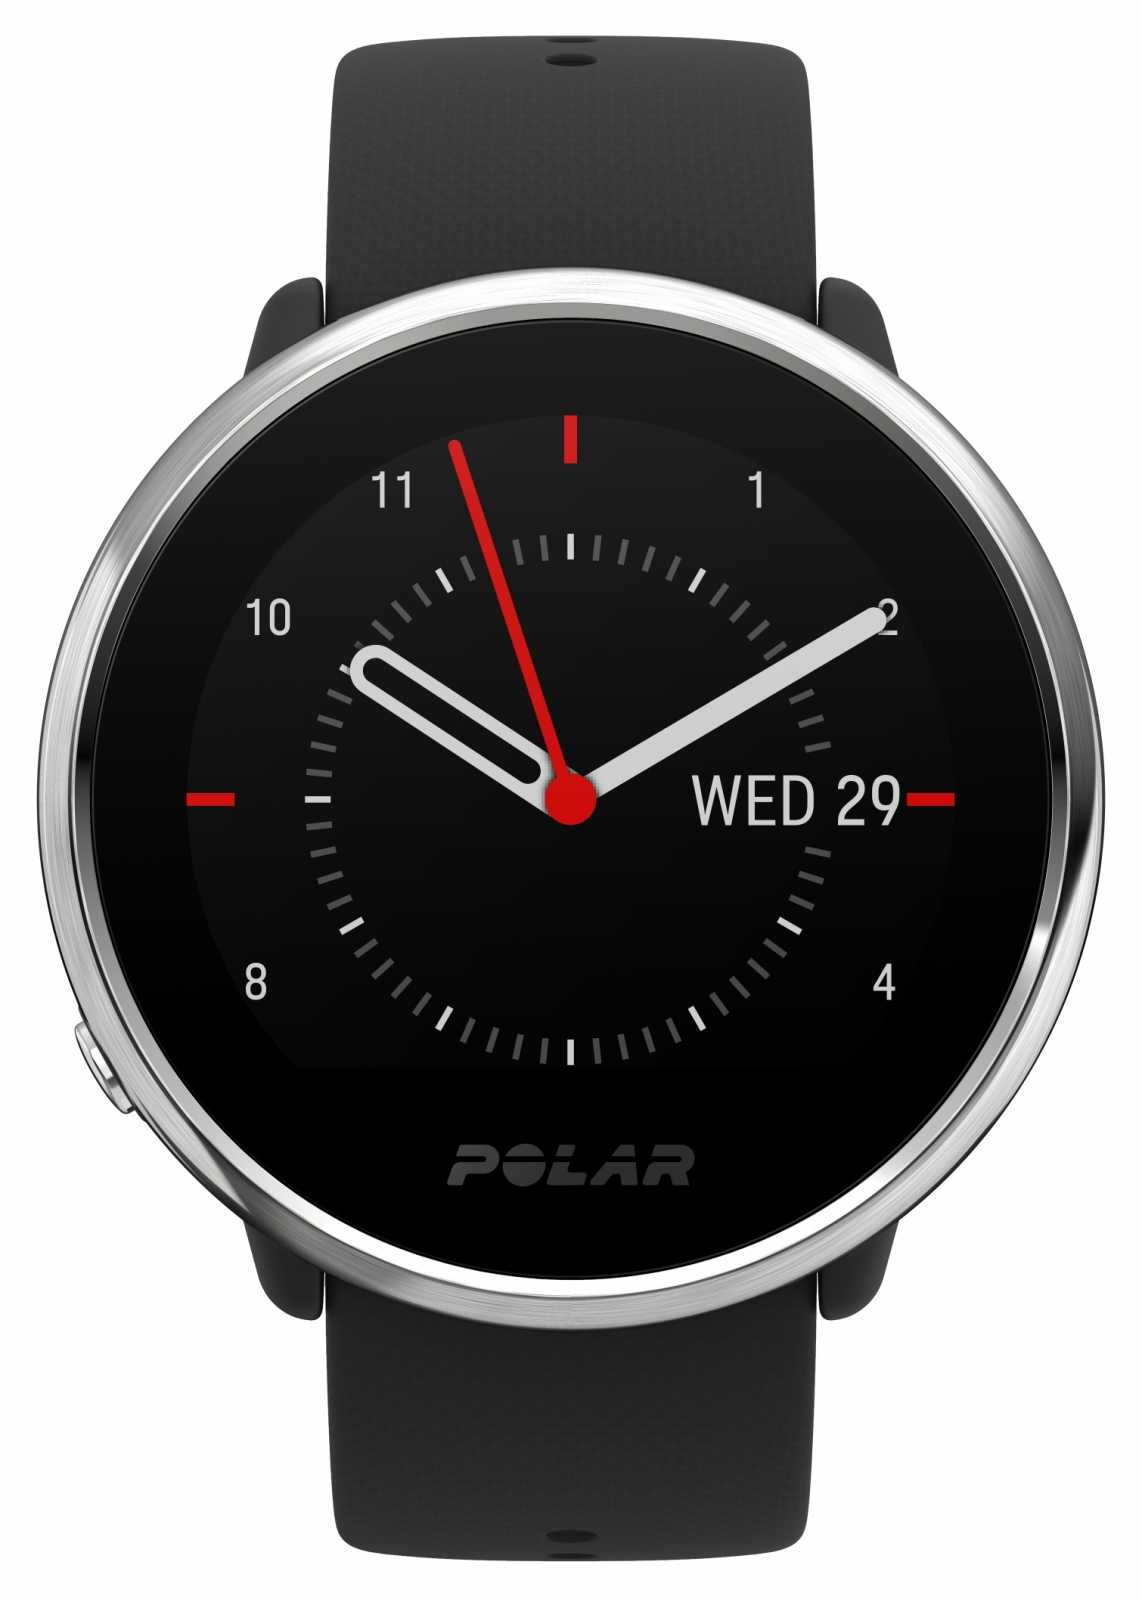 Polar | Ignite | Activity and HR Tracker | Black 90071063 Wa